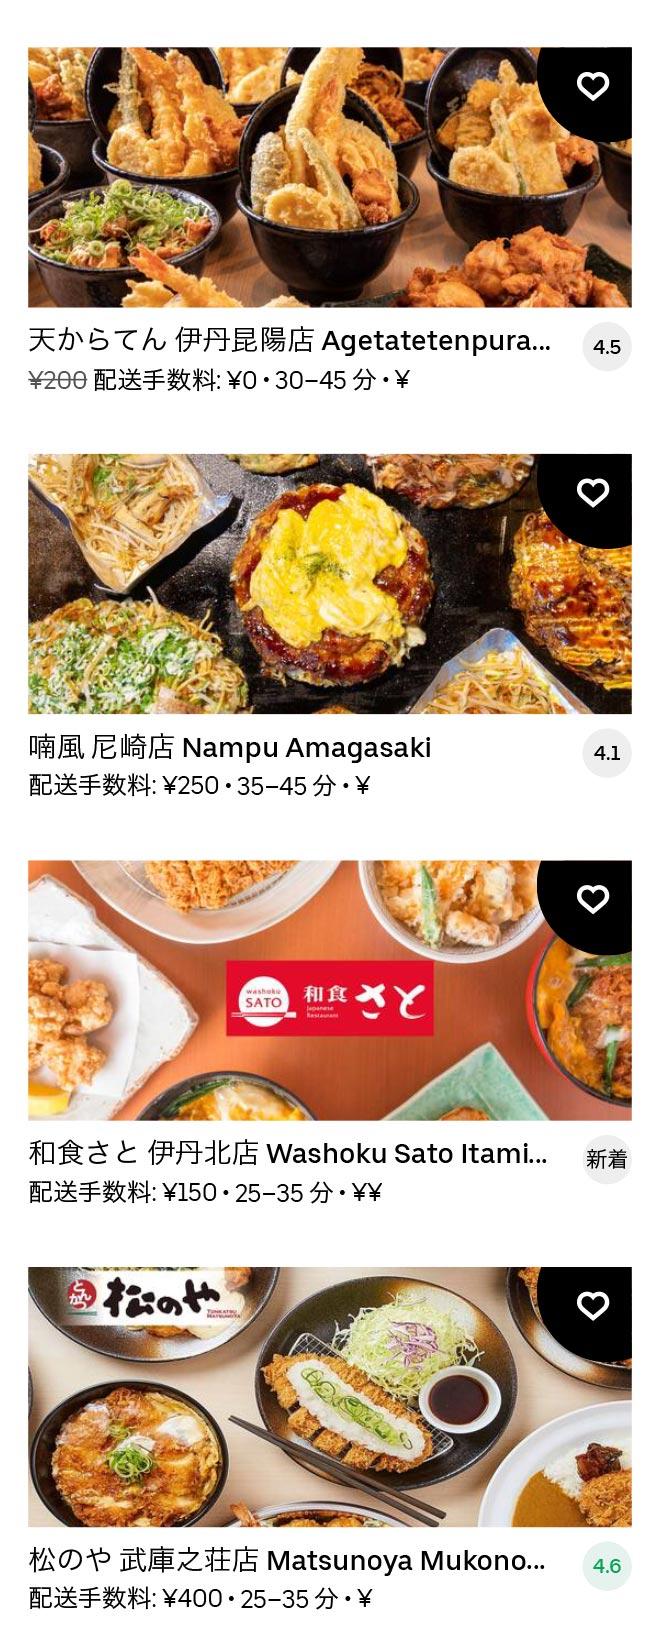 Hankyu itami menu 2011 12